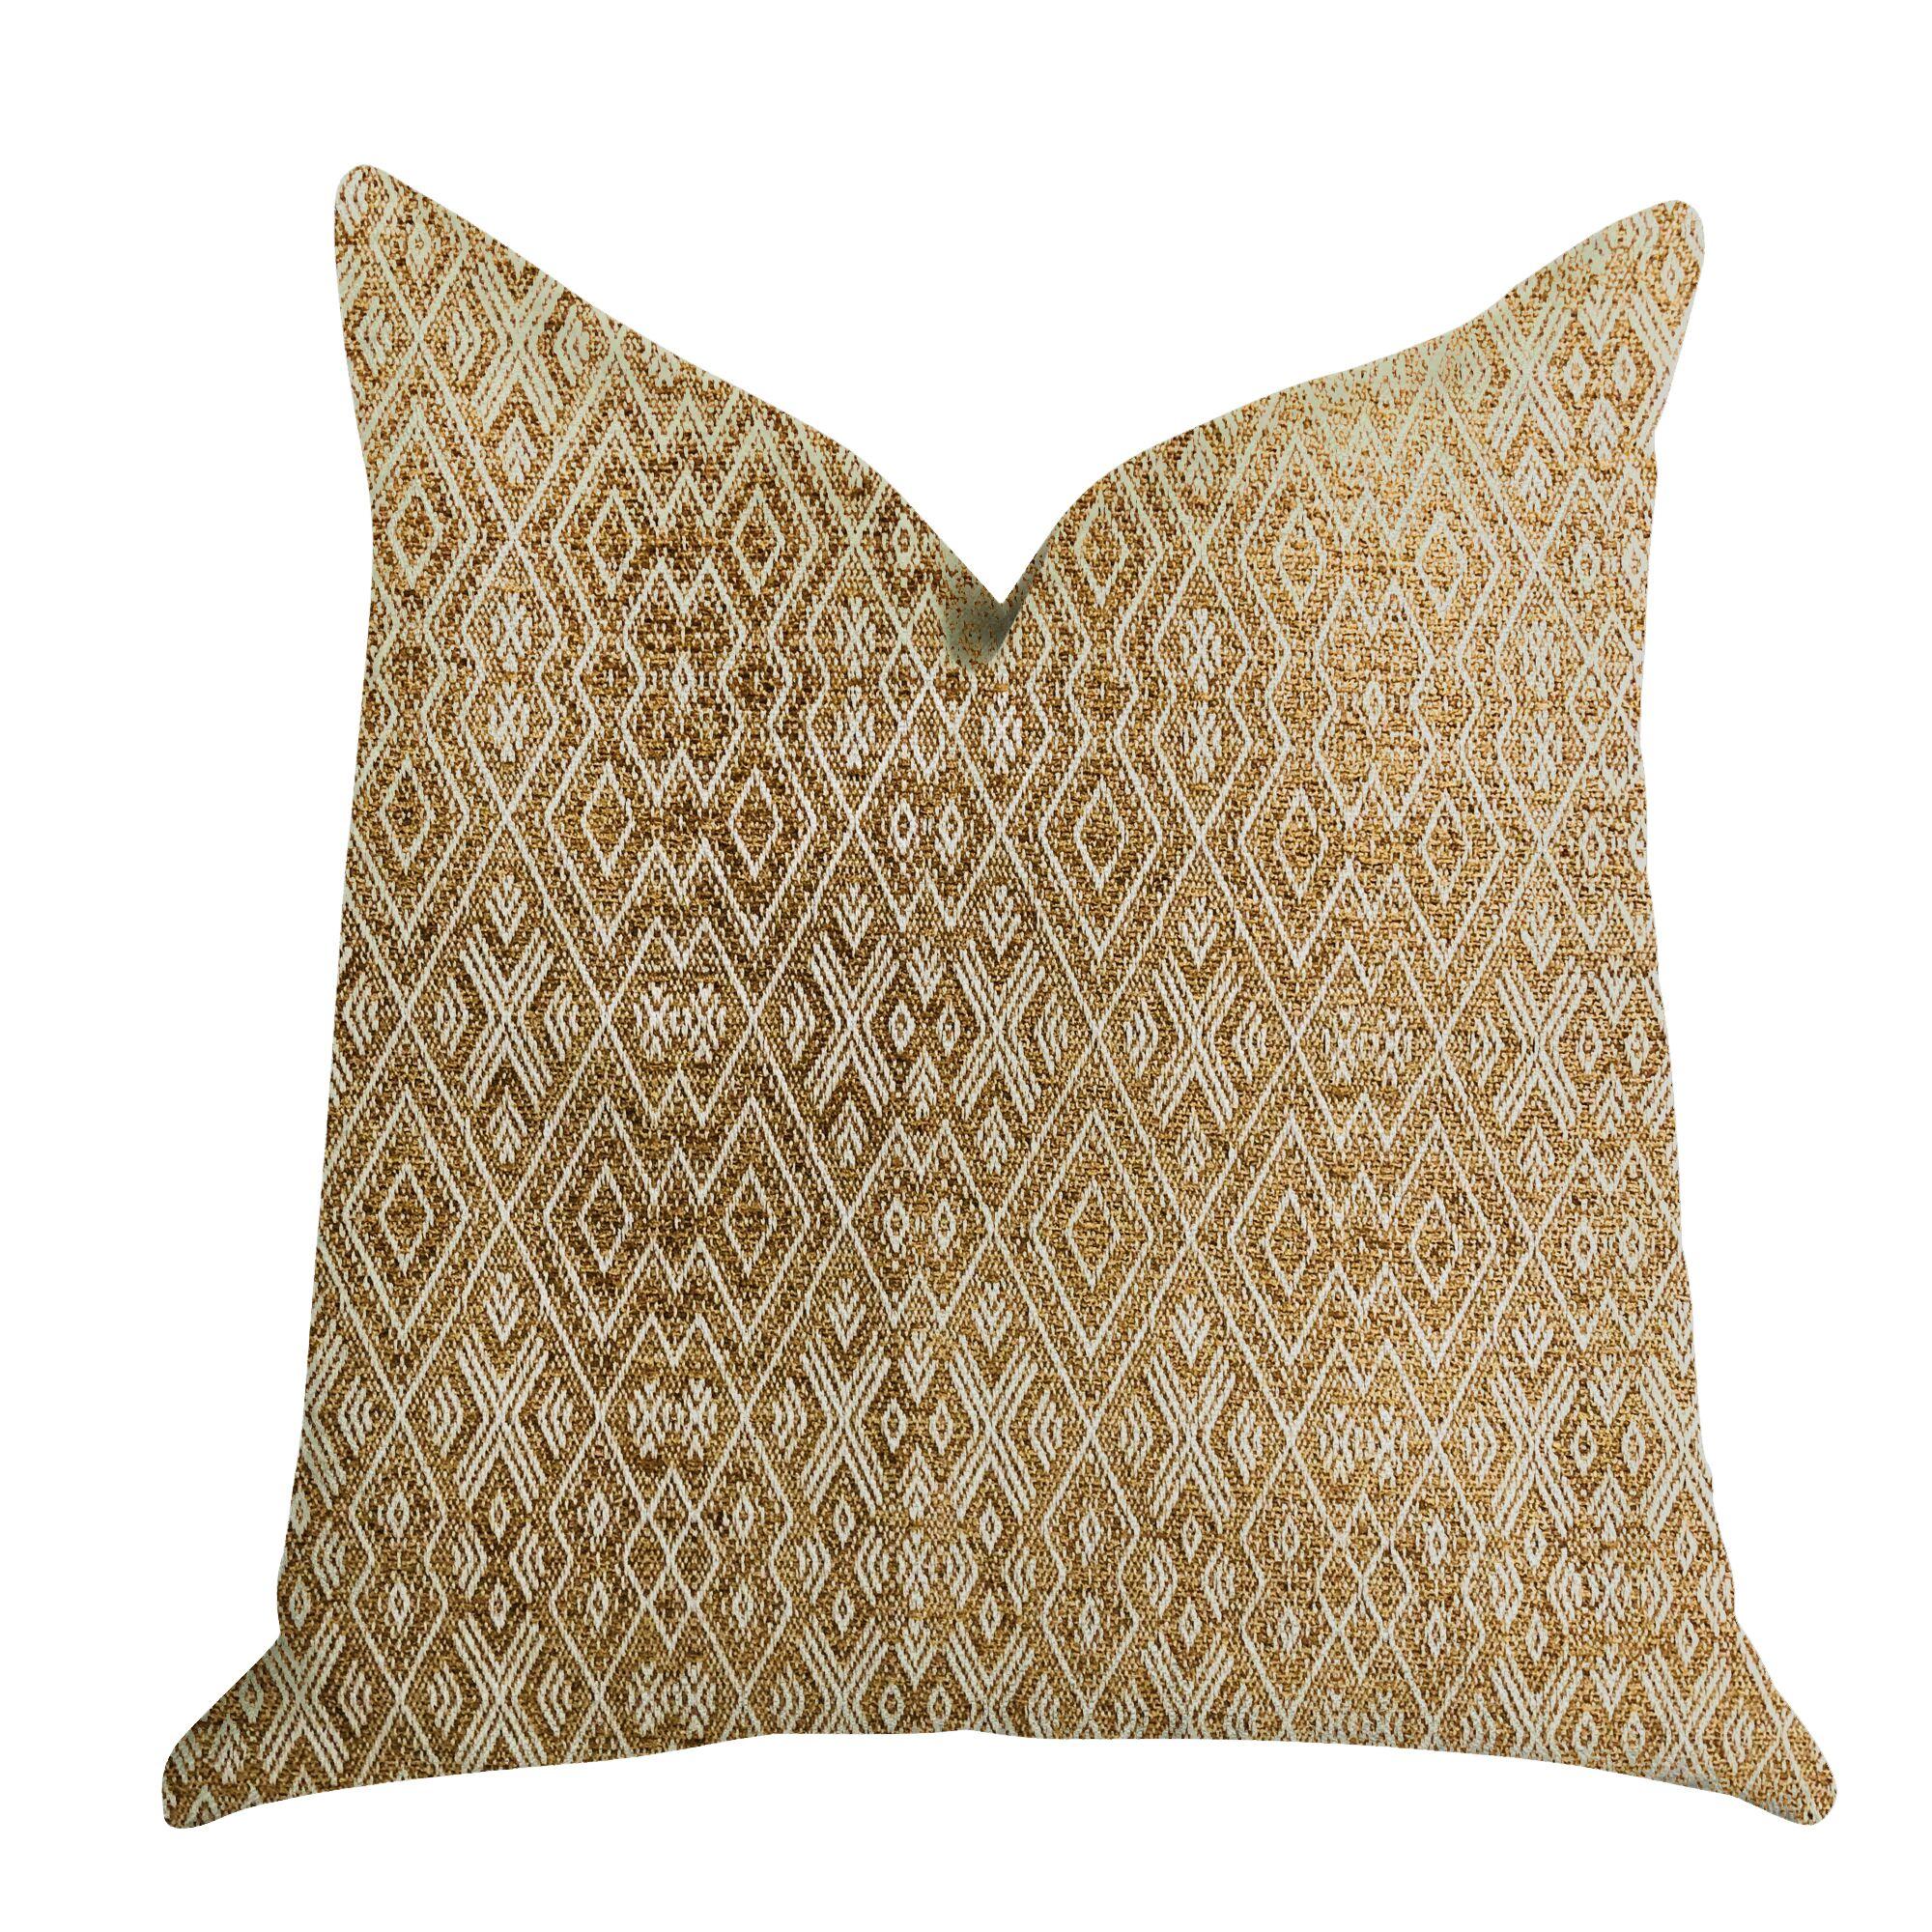 Demartini Gem Luxury Pillow Size: 12